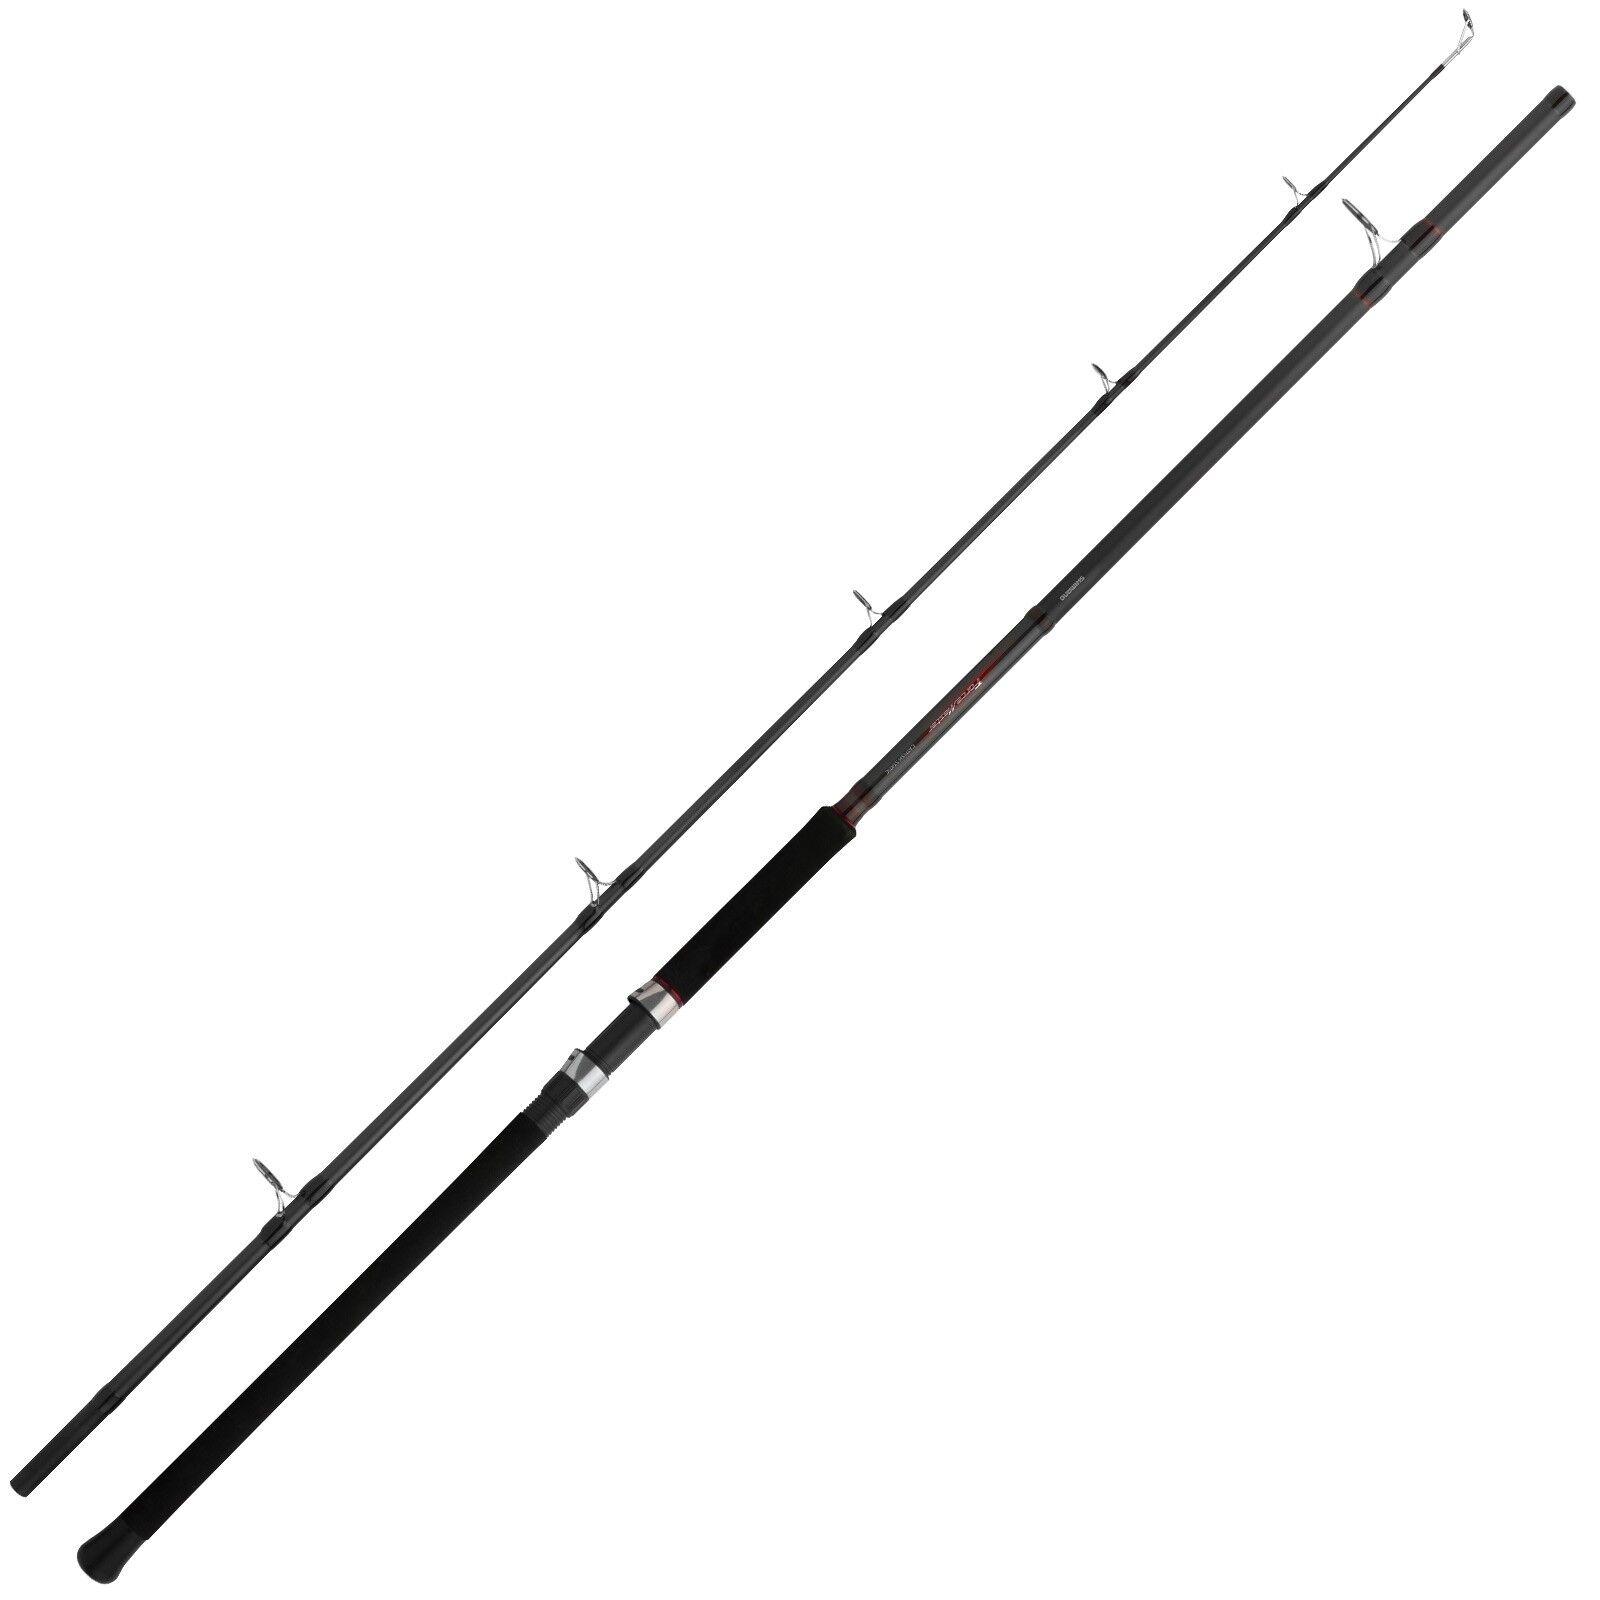 Shiuomoo Wtuttierrute Forcemaster Pesce Gatto Statico 300 3,00m 500g